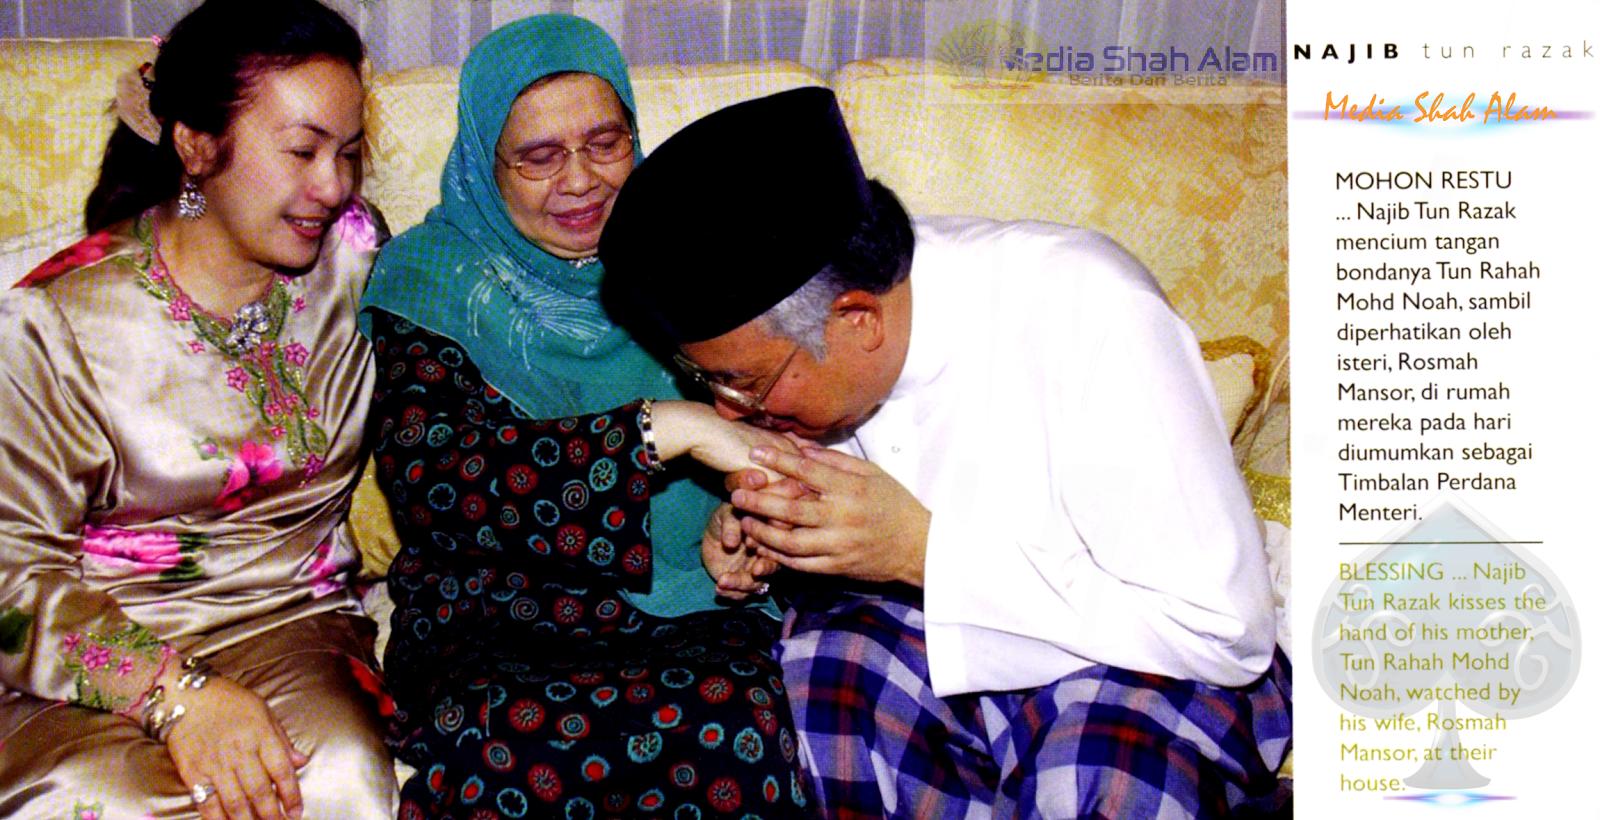 Datuk Seri Najib